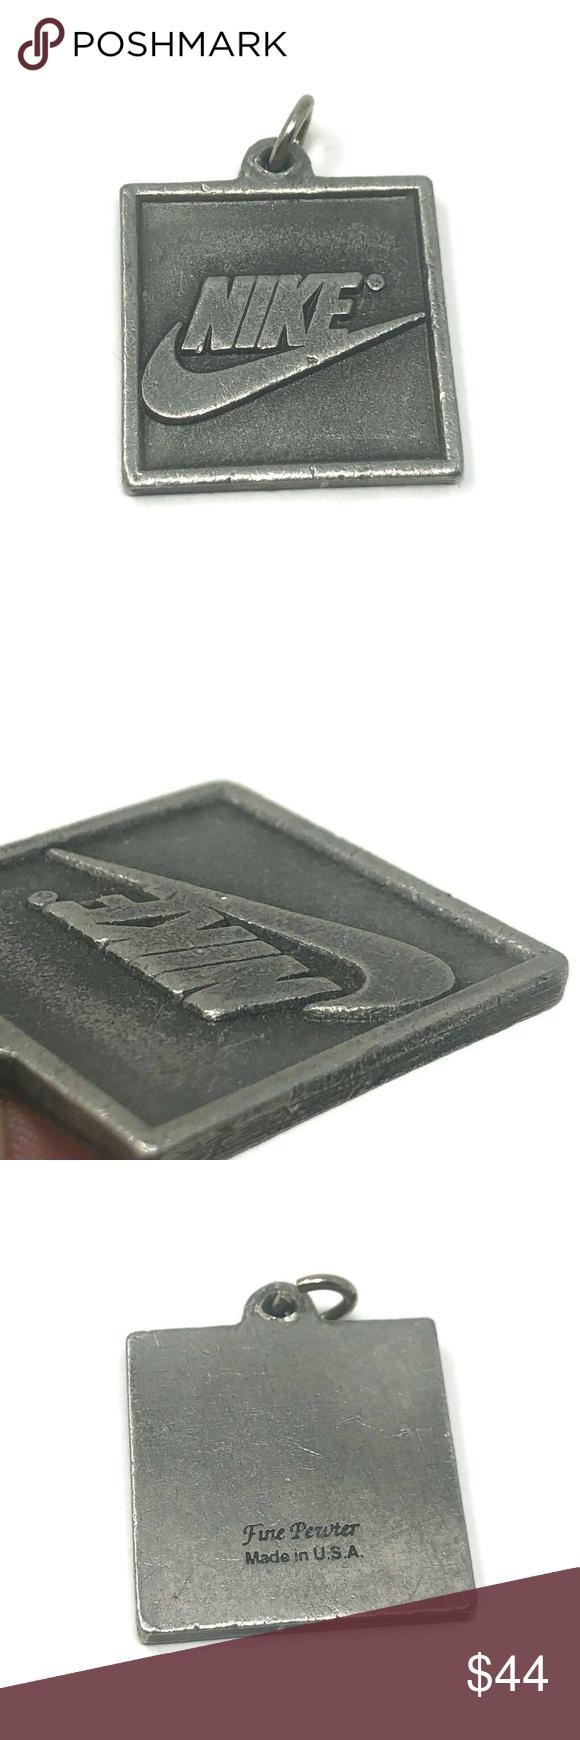 Vintage Nike Pewter Keychain Pendant 1 1 4 Rare Vintage Nike Pewter Pendant Rare Nikes